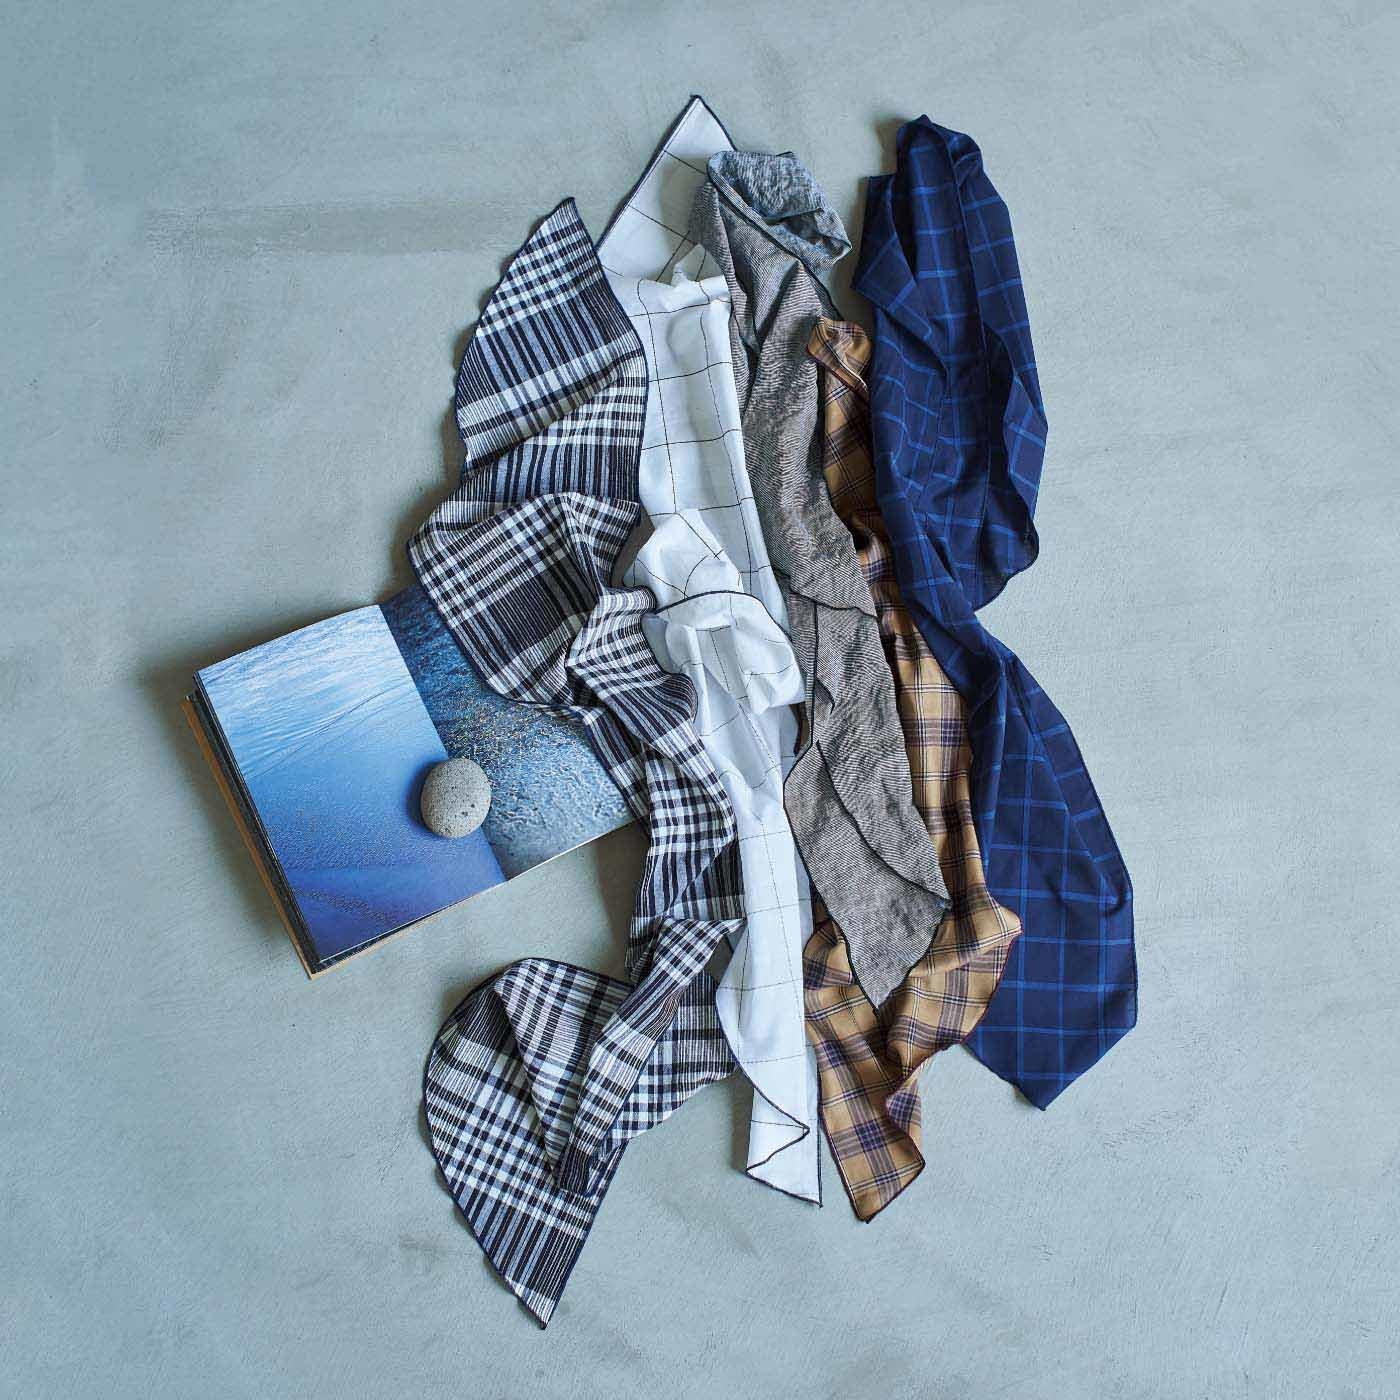 el:ment いつもの装いが華やぐ マルチに使える播州織スカーフの会